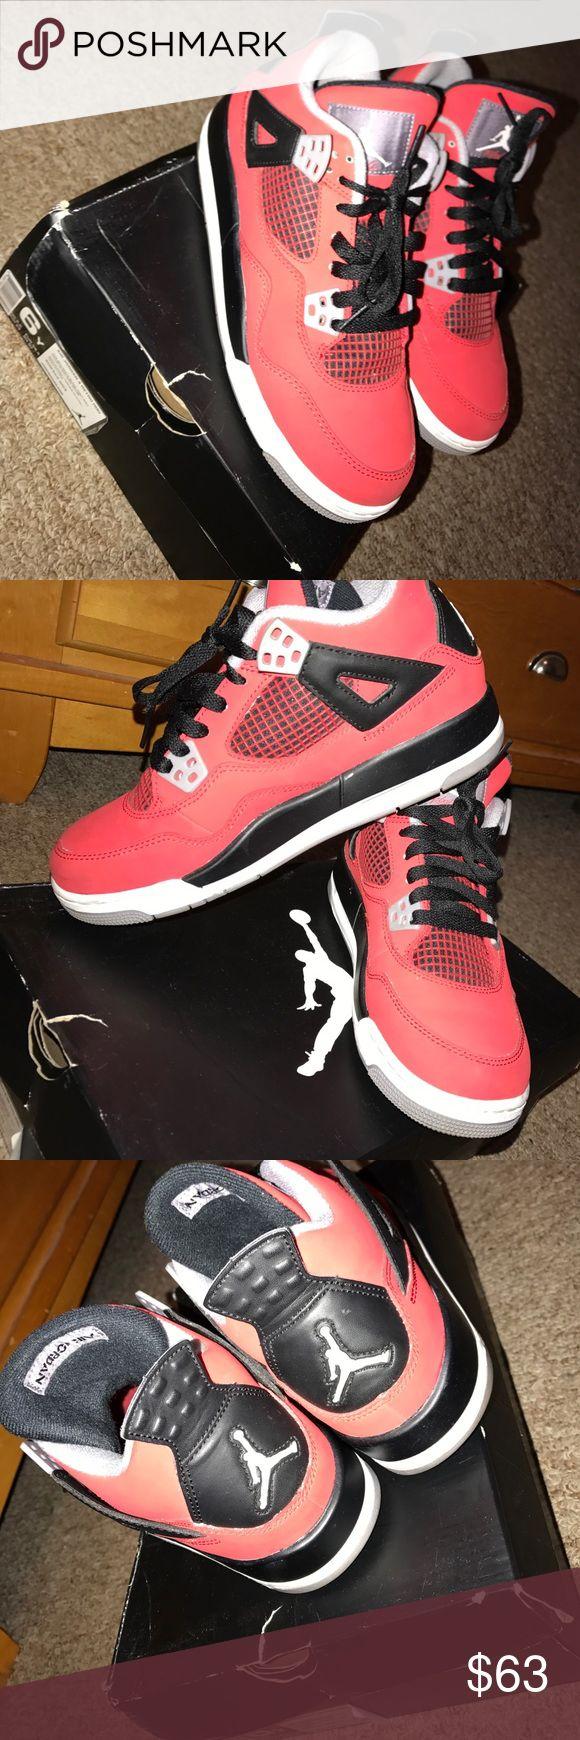 Fire Red Air Jordan Retro 4s Jordan Retro 4s, Size 6 in kids/men, Fire Red/Black/White Jordan Shoes Sneakers